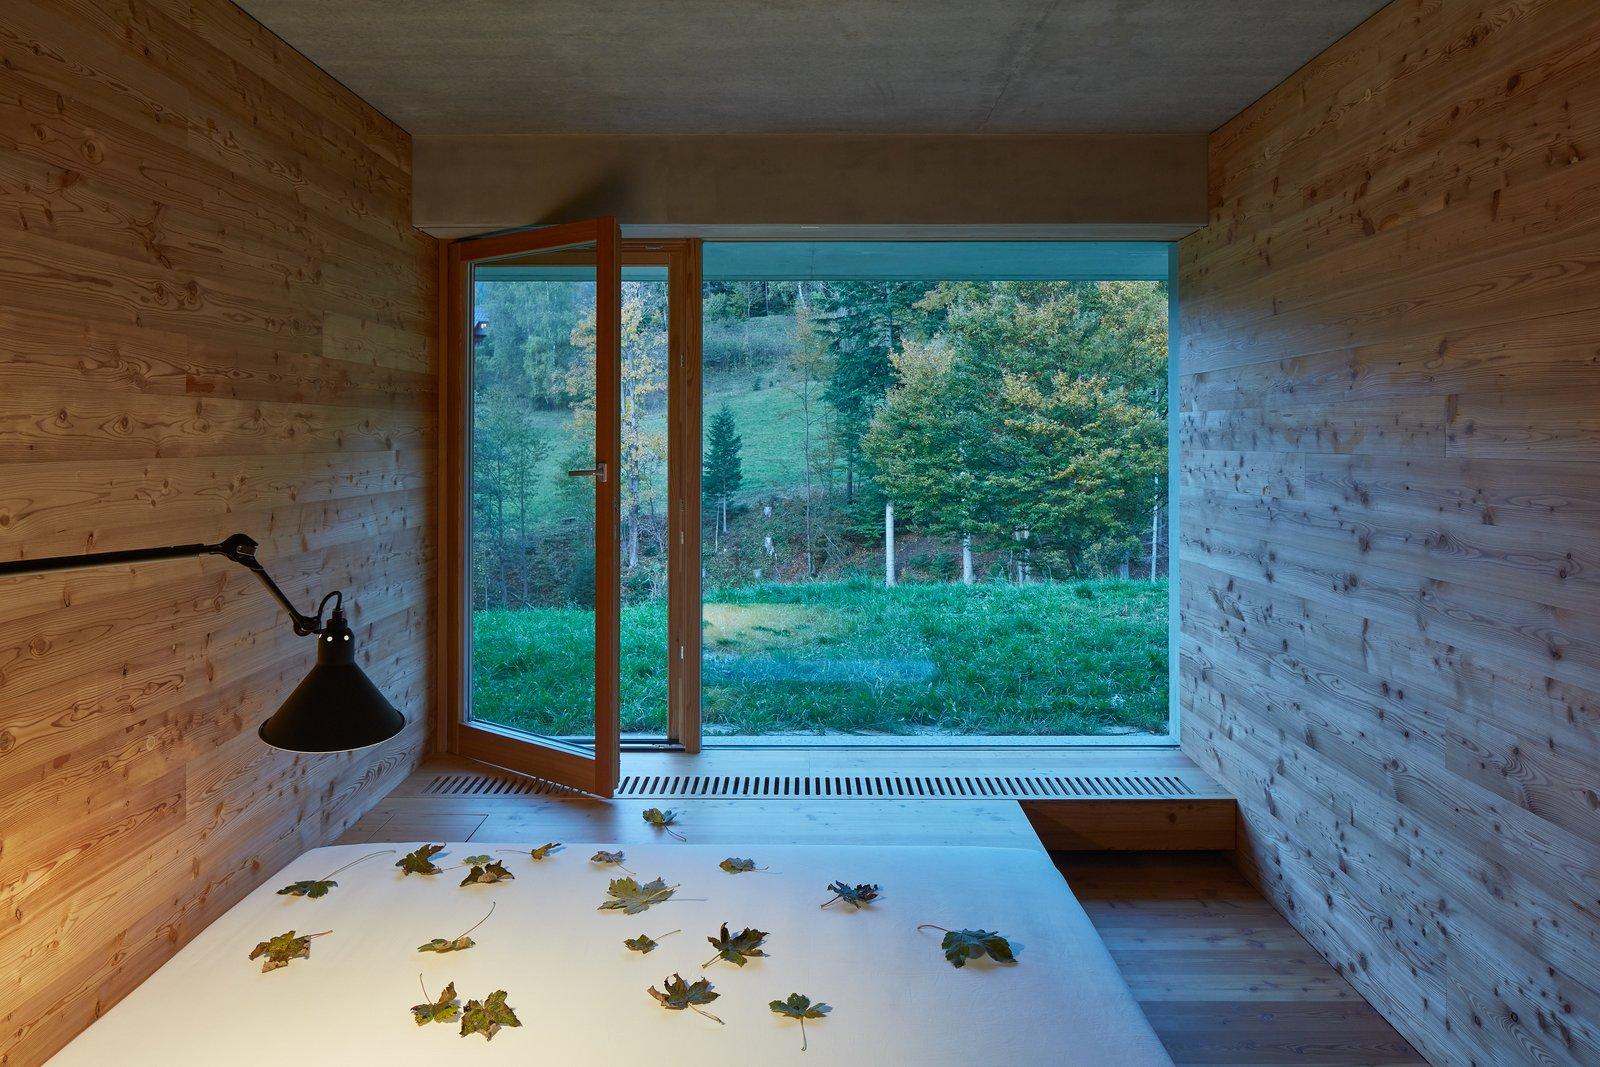 Bedroom, Bed, Wall Lighting, and Medium Hardwood Floor  Photos from Weekend House in Beskydy